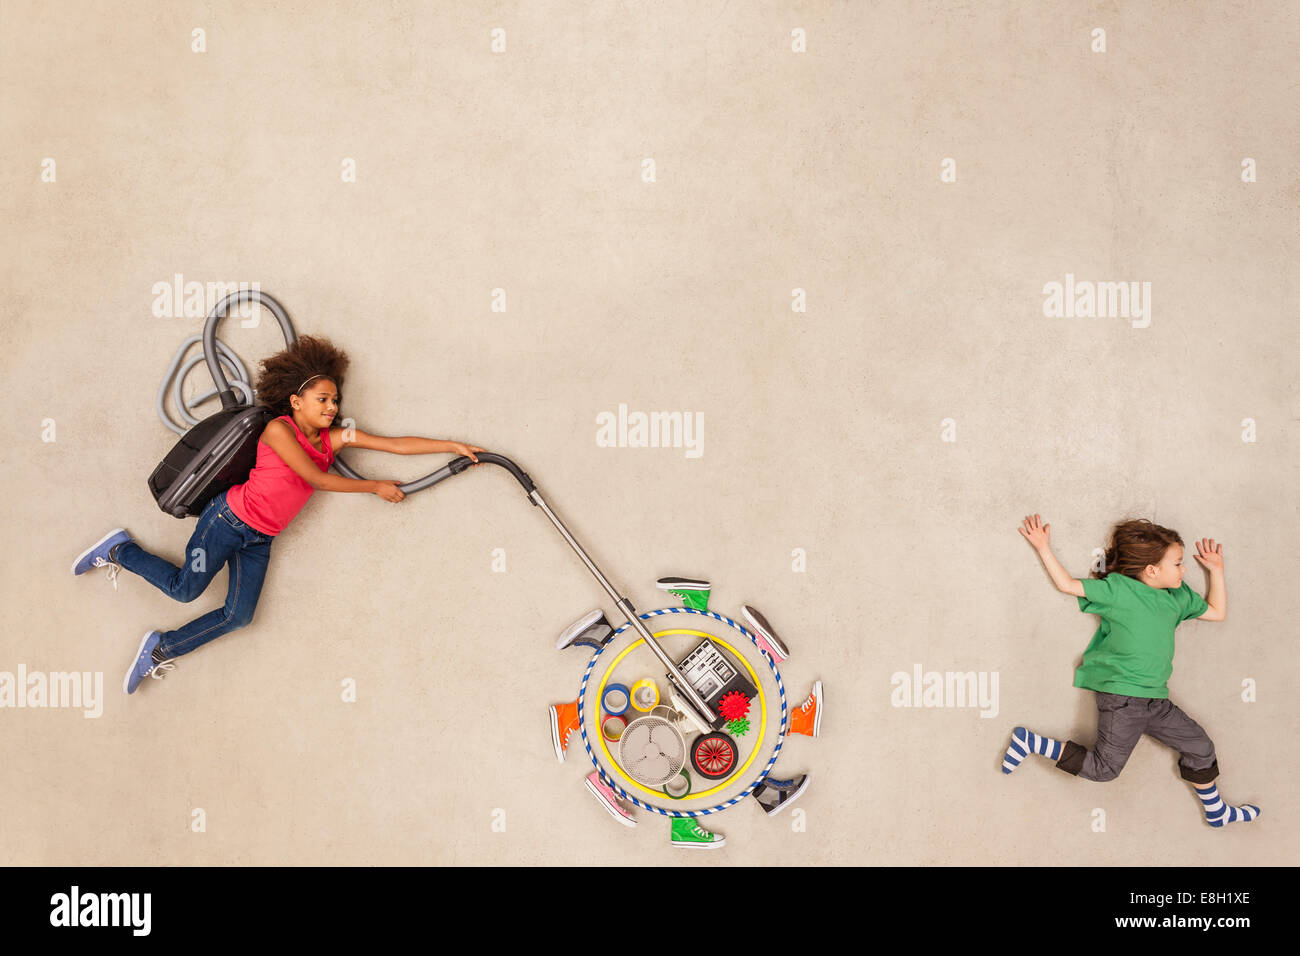 Children developing new gadgets - Stock Image